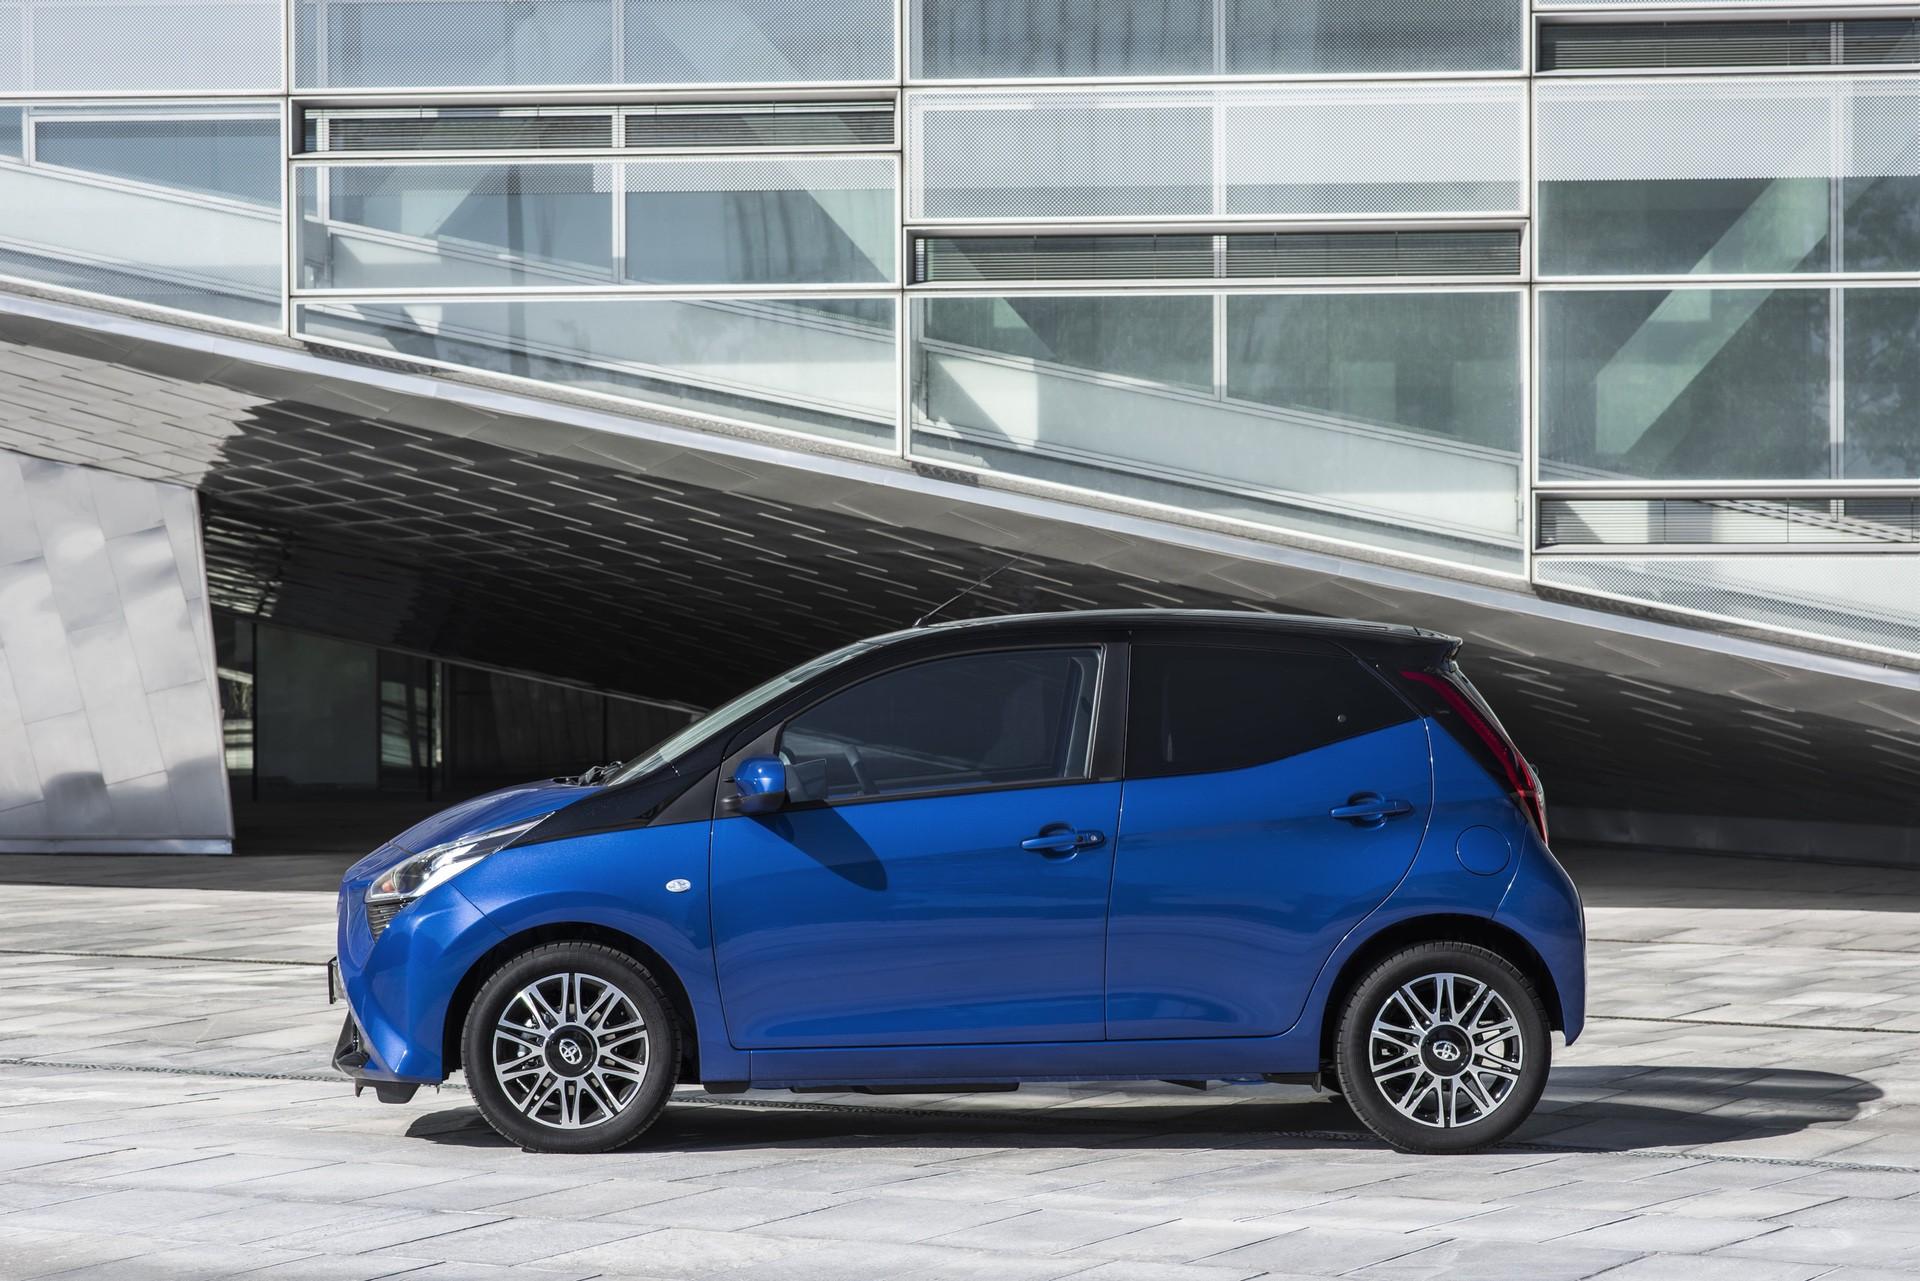 Toyota_Aygo_facelift_presskit_0029